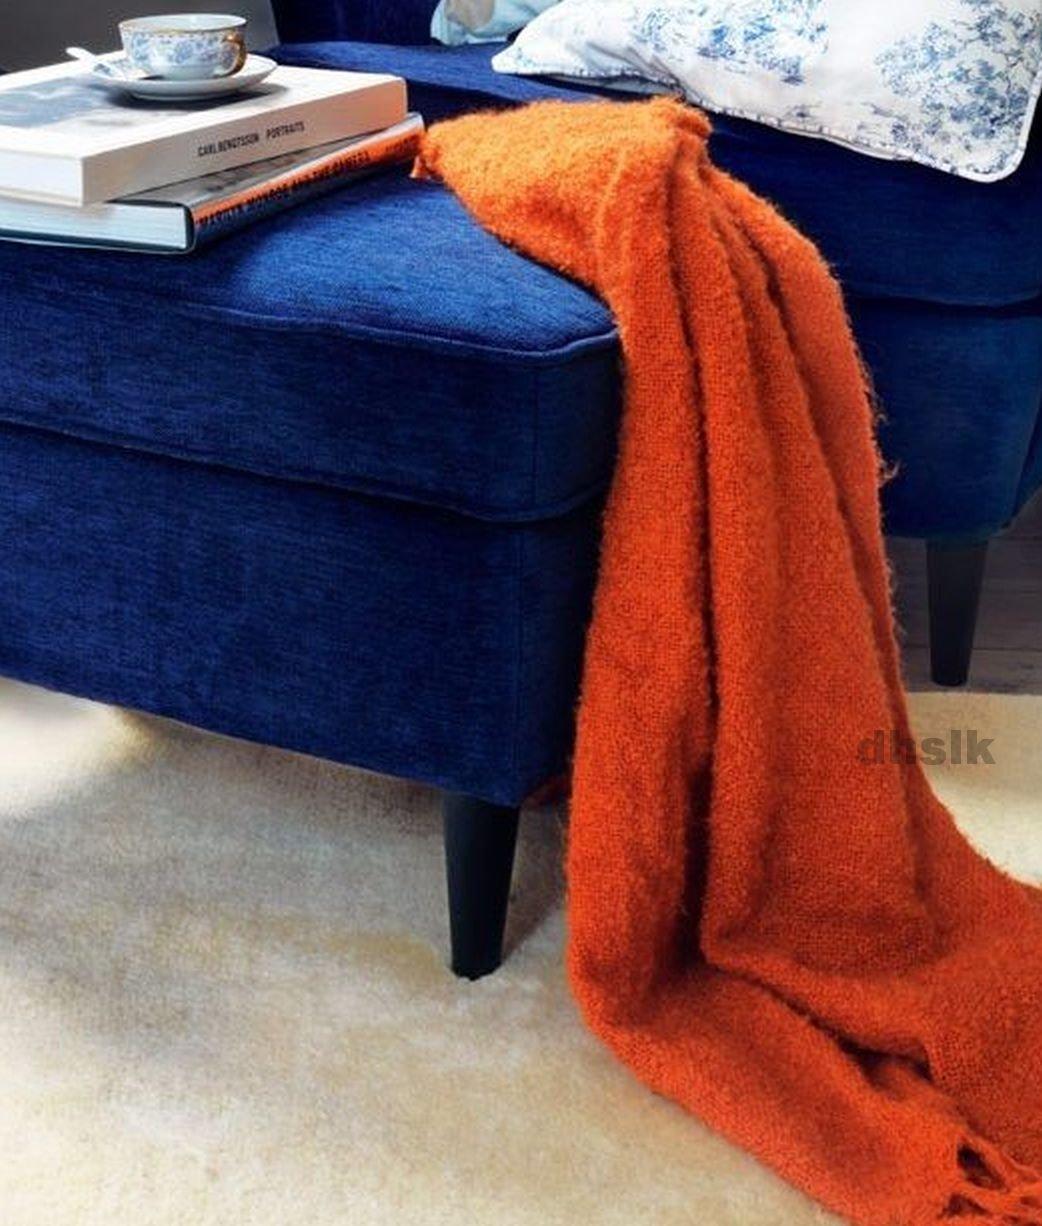 IKEA RITVA ORANGE Throw BLANKET Afghan SOFT Mohair Blend  : 5257204b5334654622b from www.ecrater.com size 1042 x 1226 jpeg 172kB